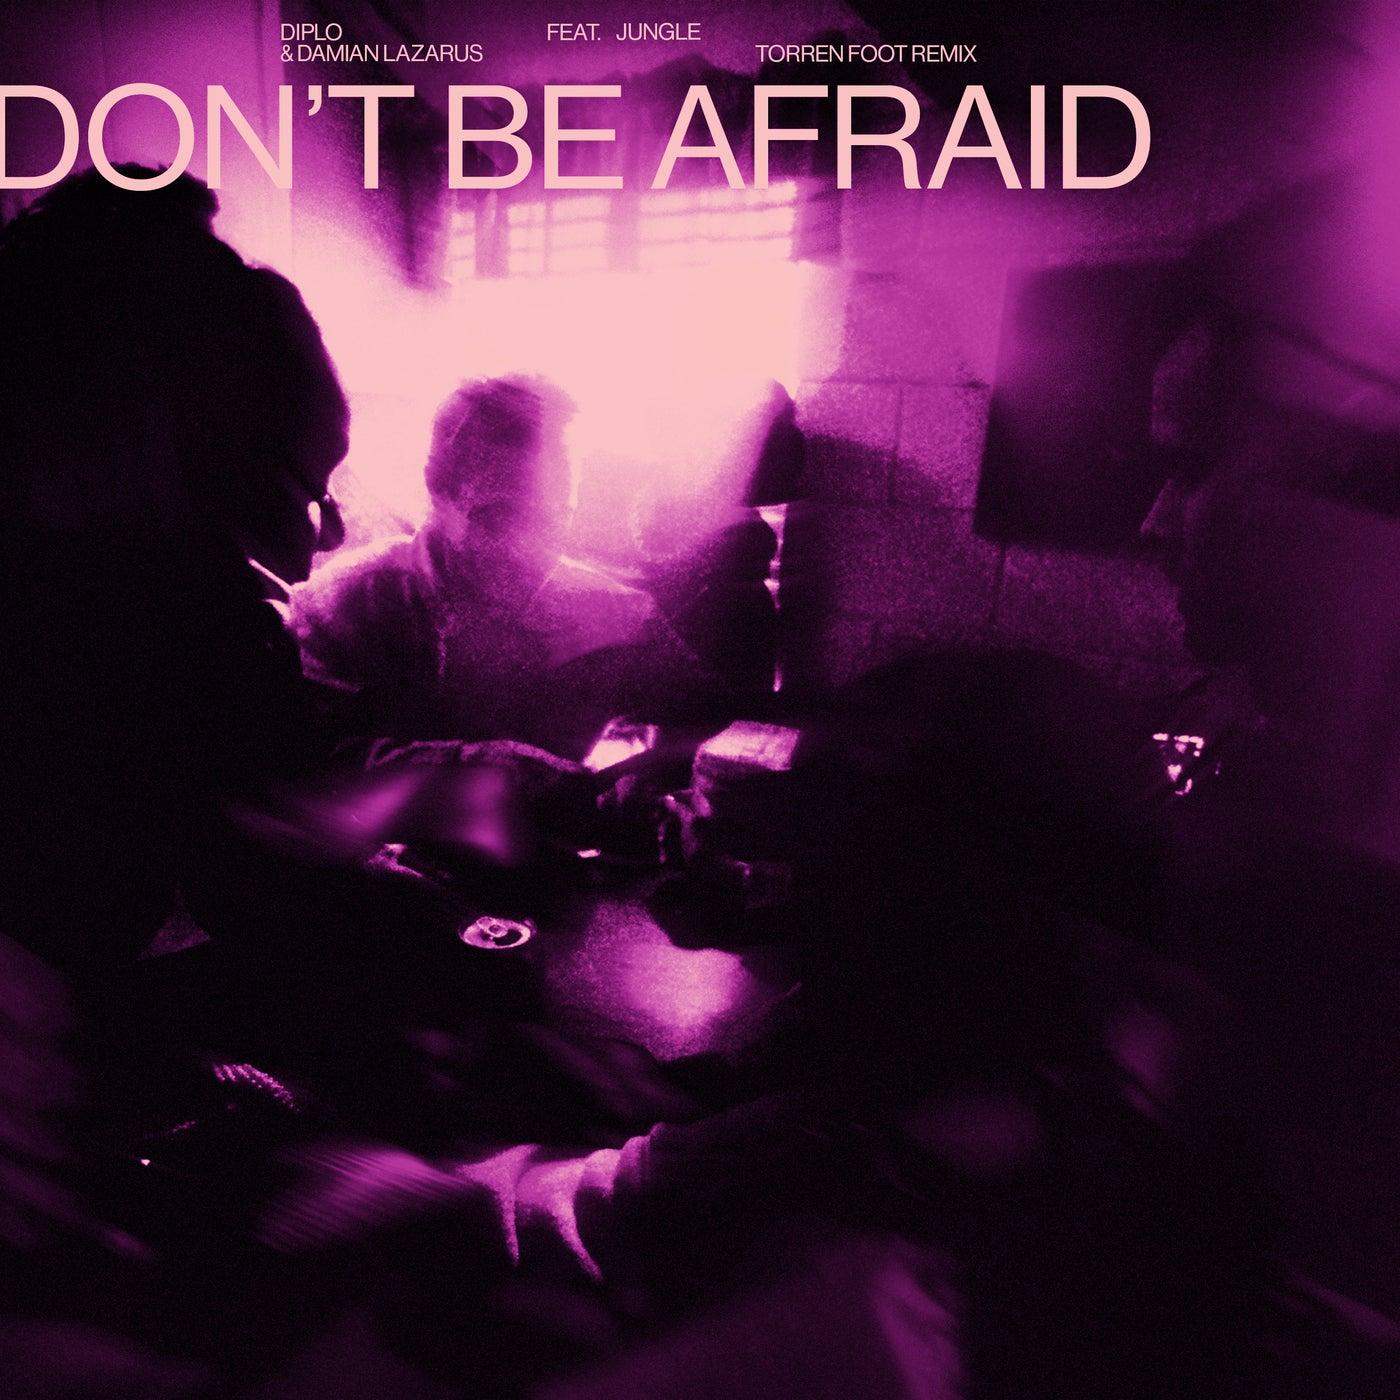 Don't Be Afraid (Torren Foot Remix (Extended))